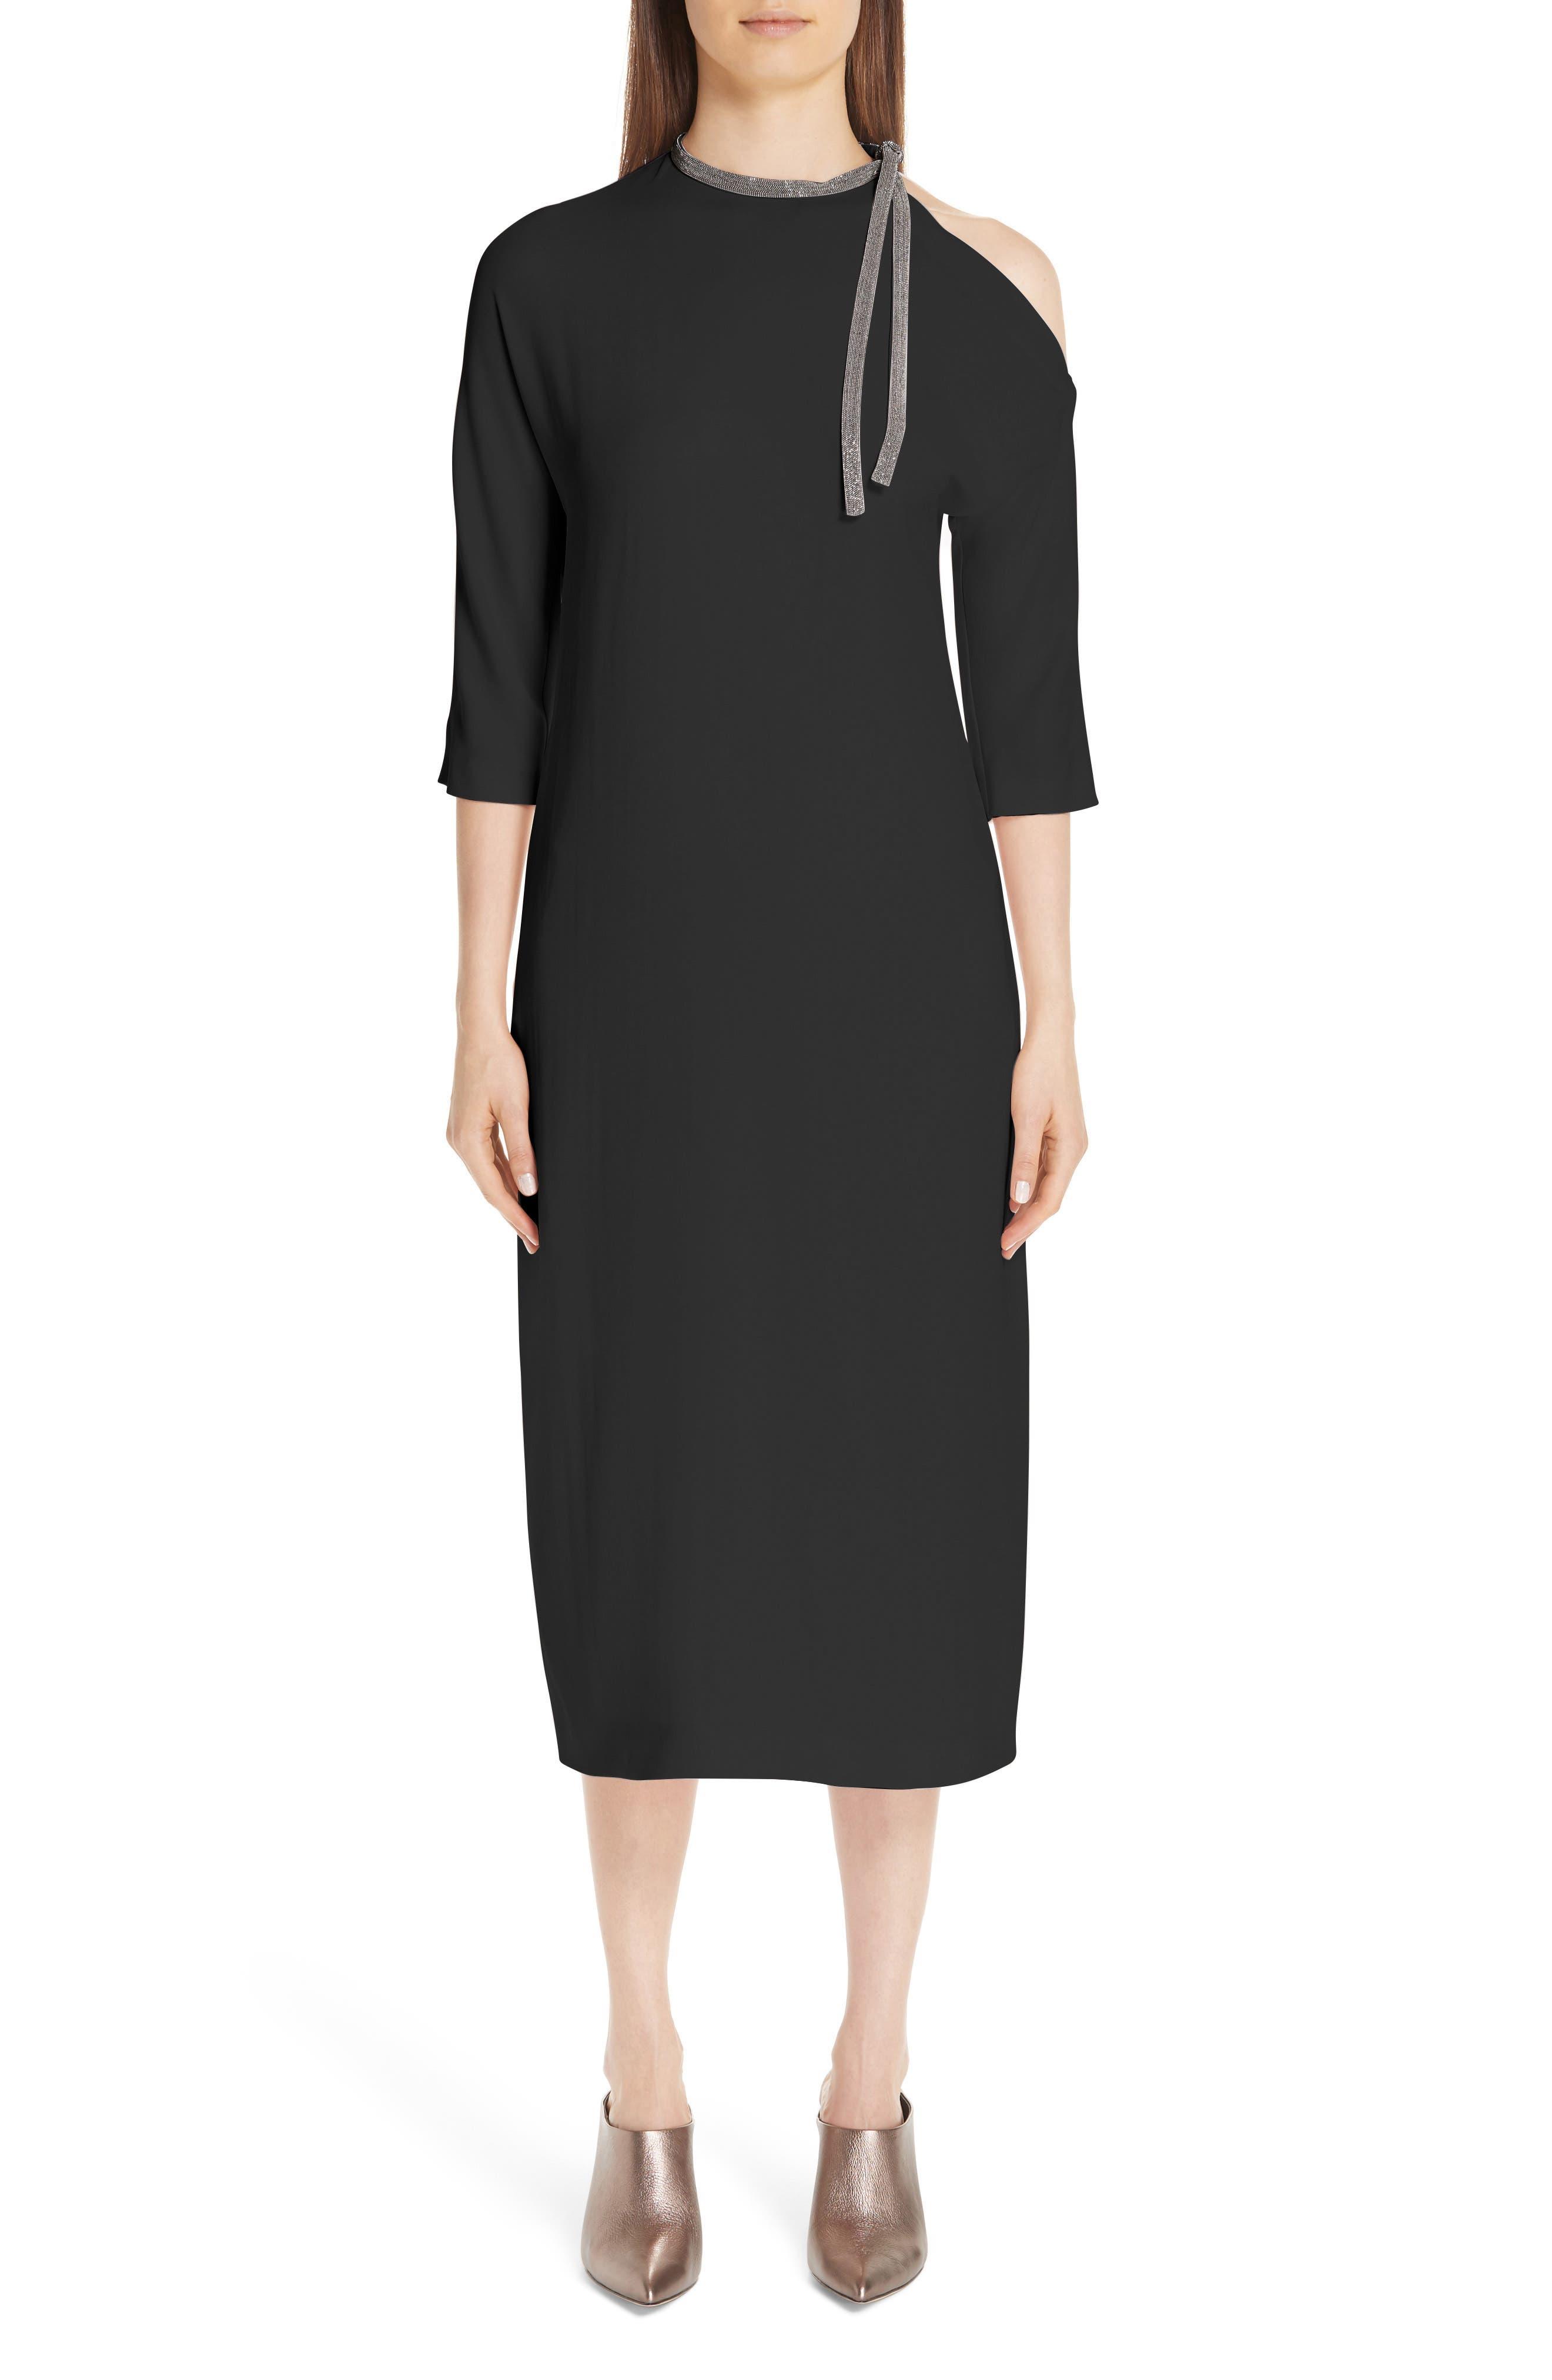 Fabiana Filippi Precious Cutout Dress, 8 IT - Black